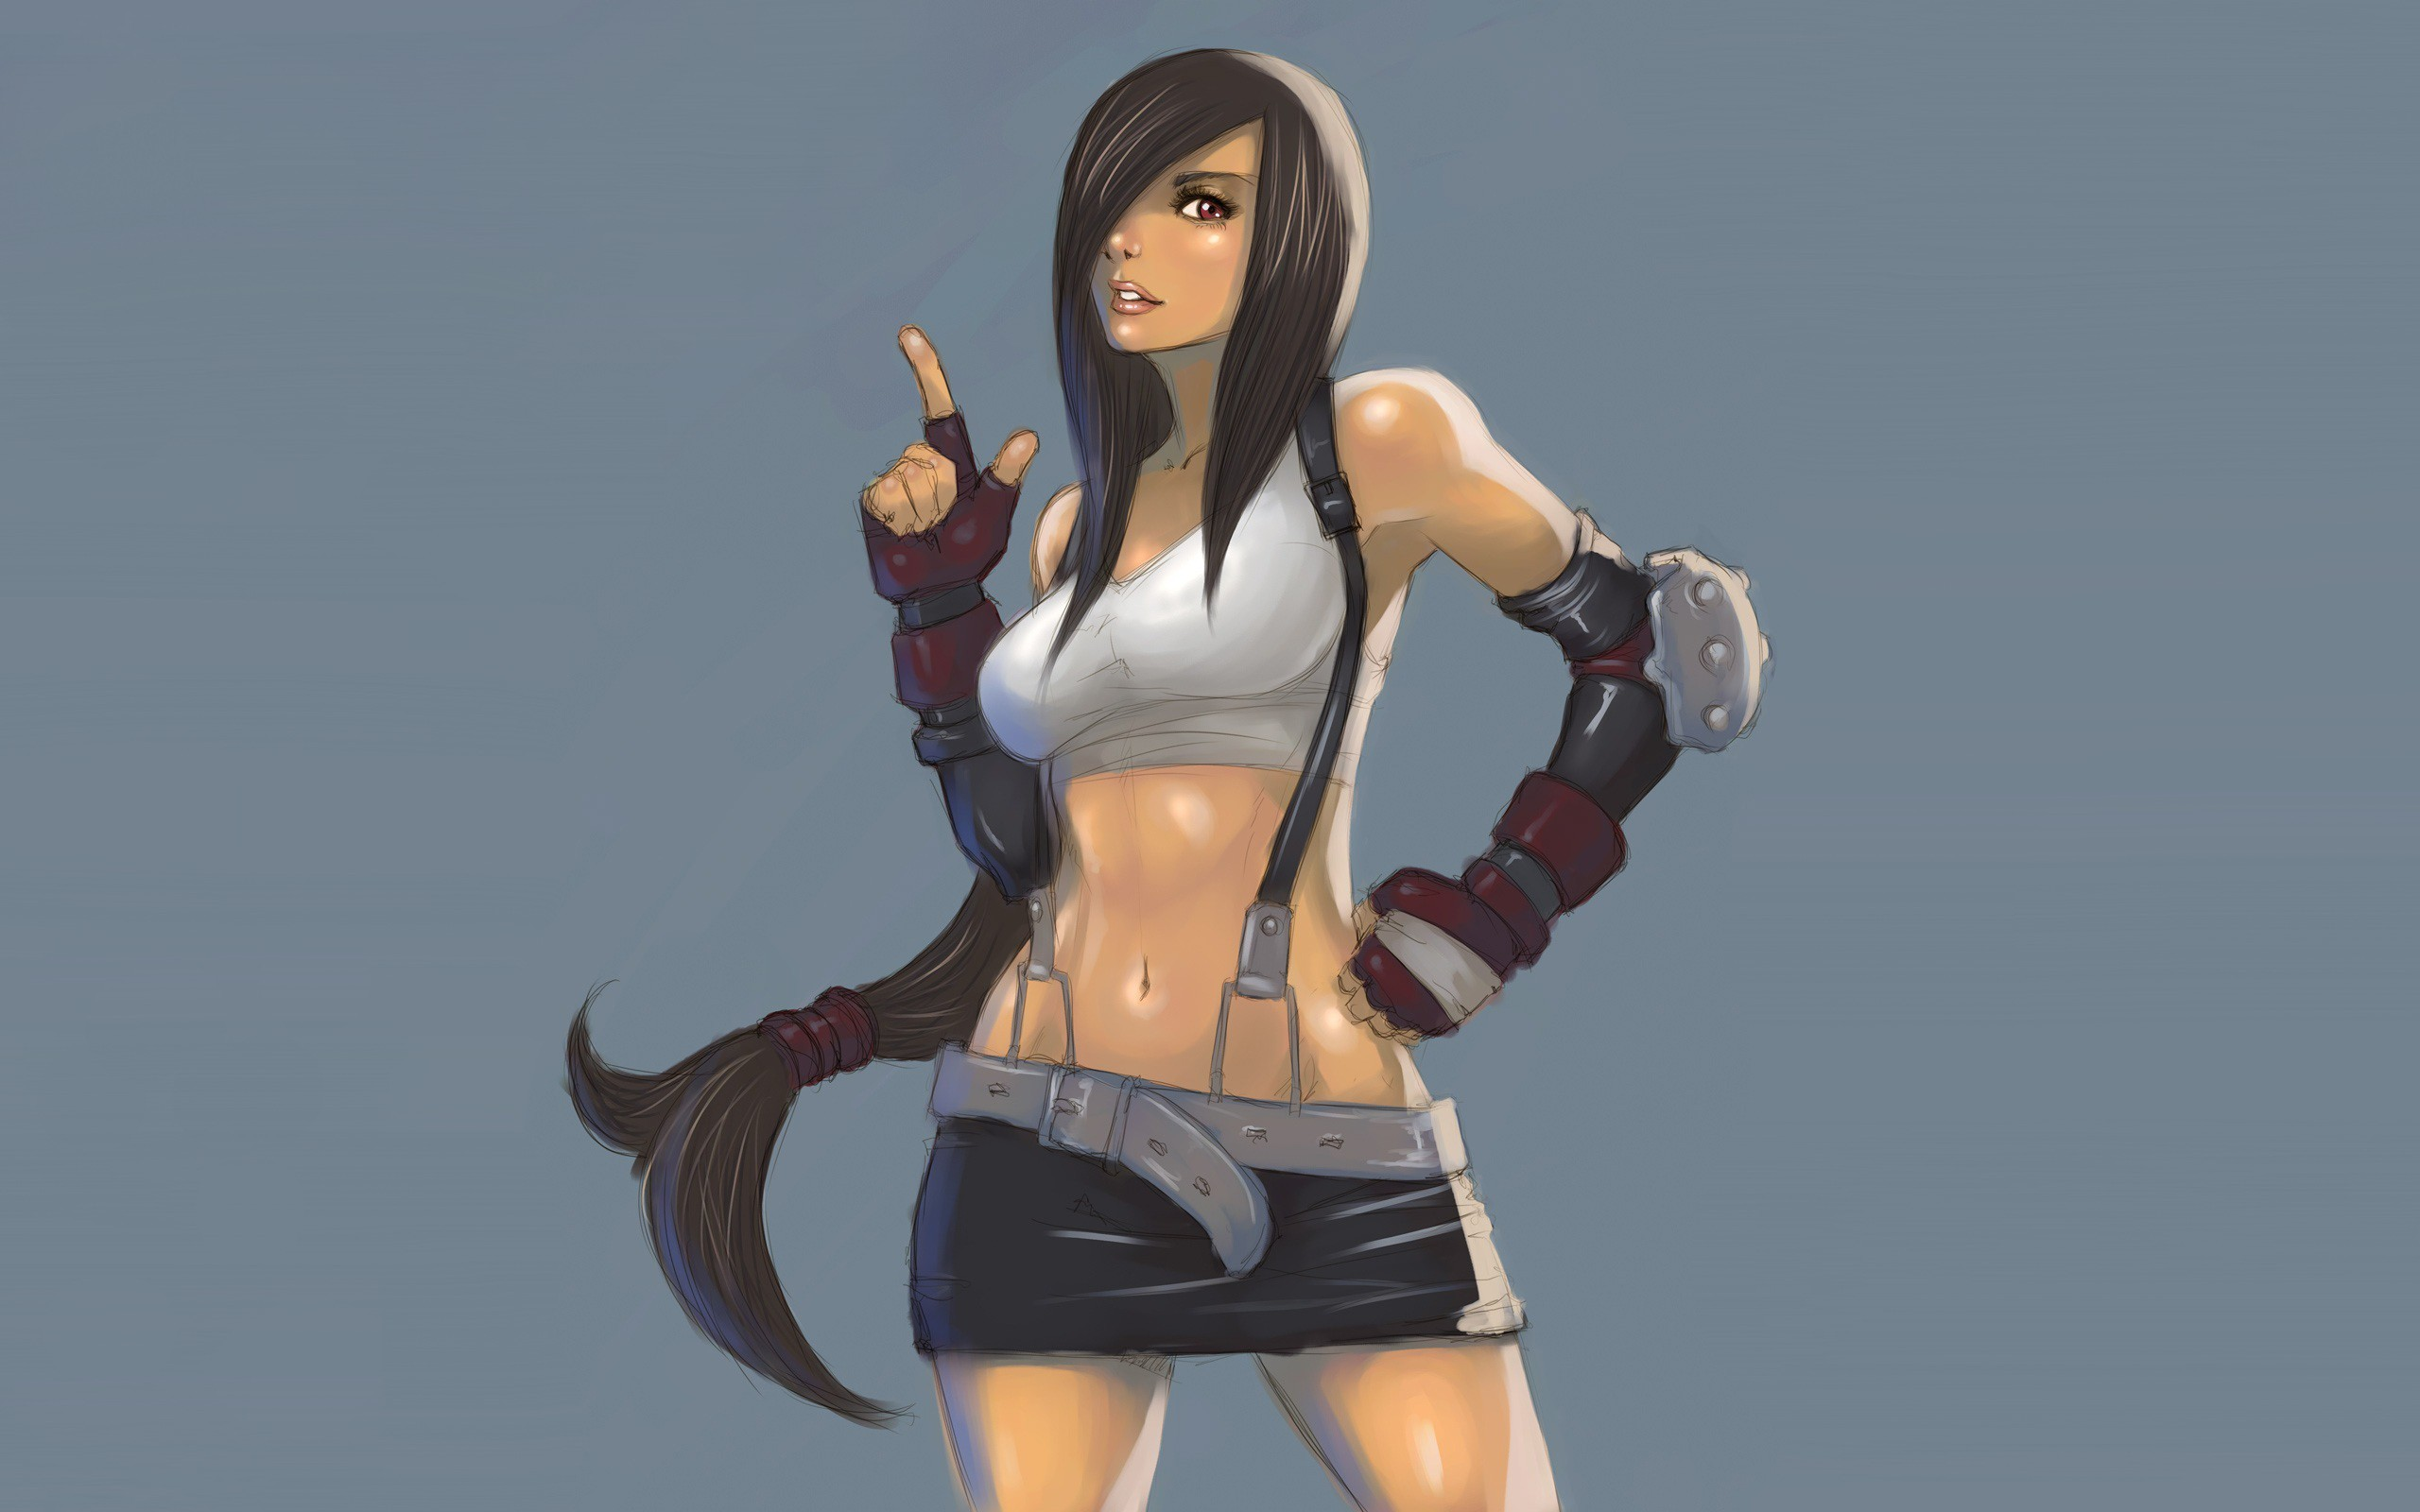 Res: 2560x1600, Final Fantasy VII Tifa Lockhart · HD Wallpaper | Background Image ID:403280